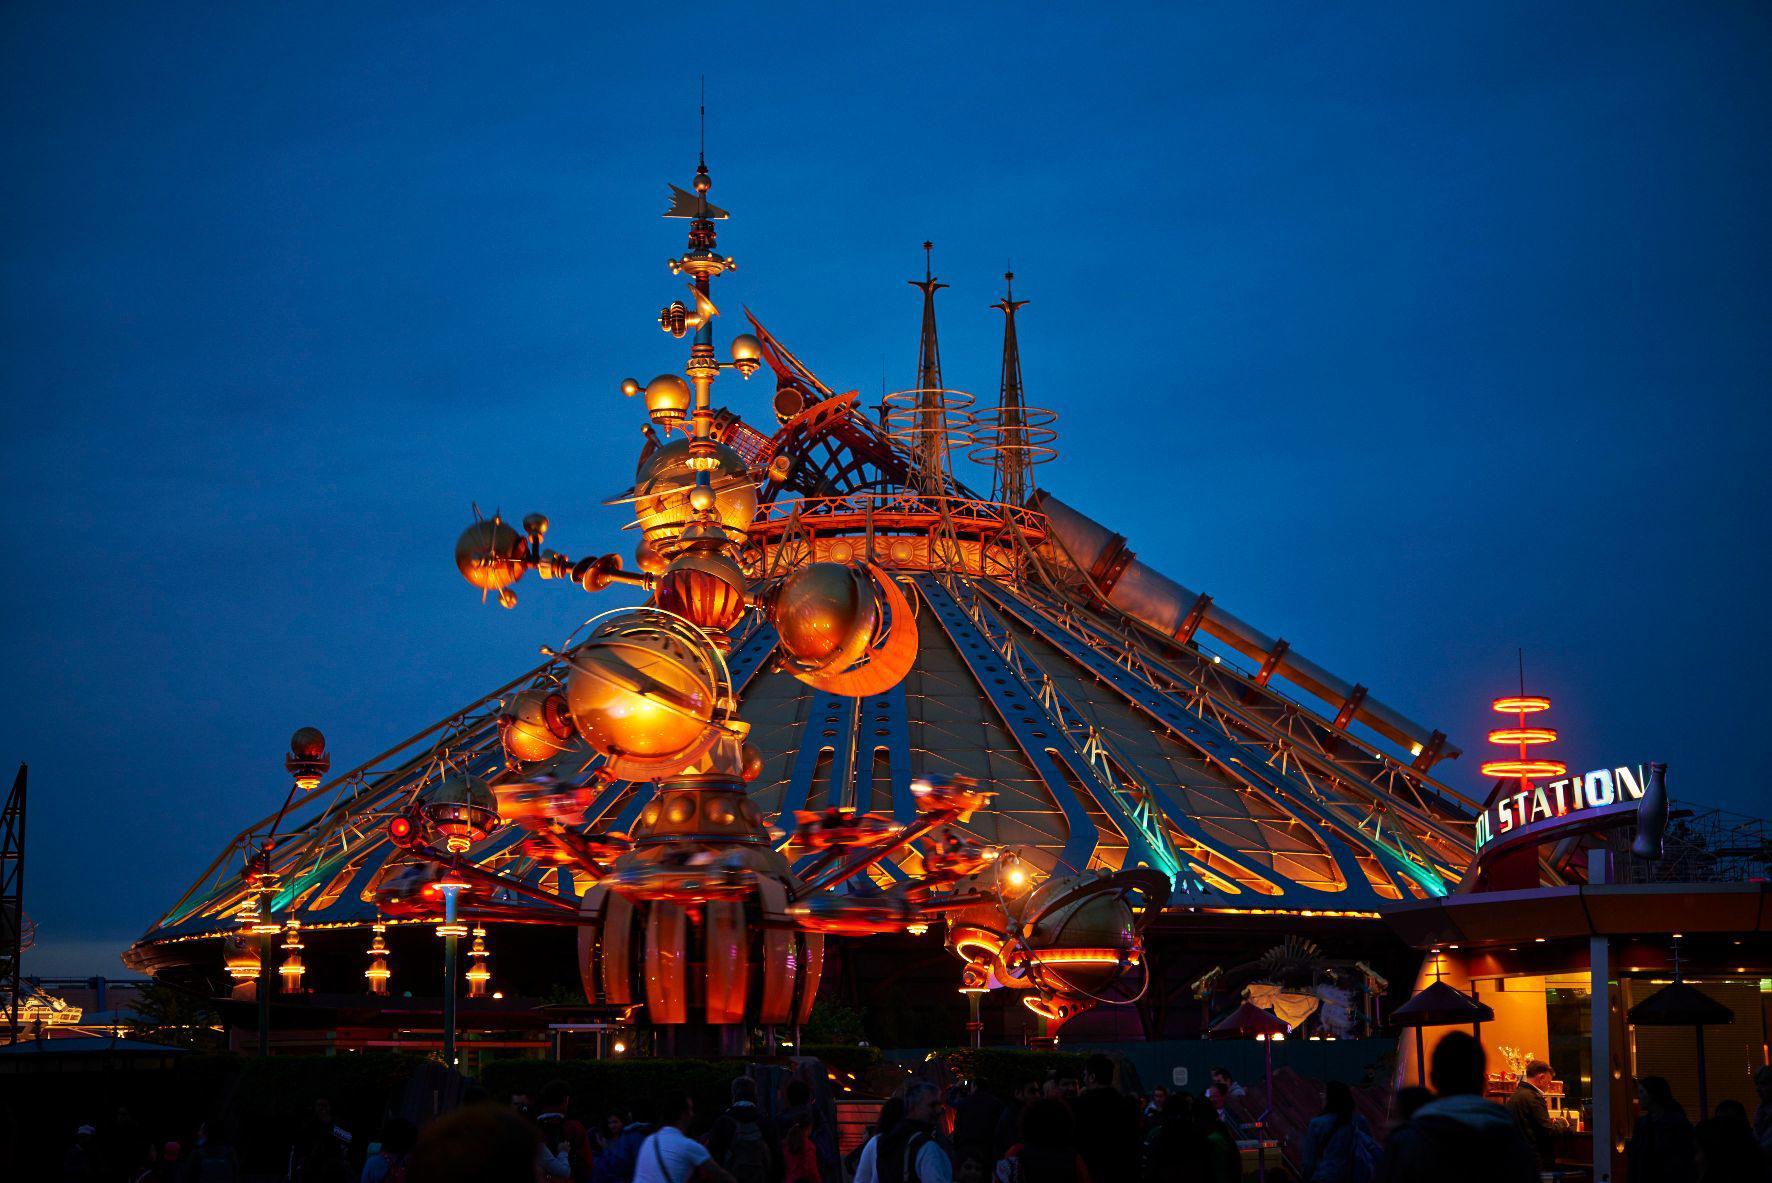 10 curiosità sulla land Discoveryland di Disneyland Paris.